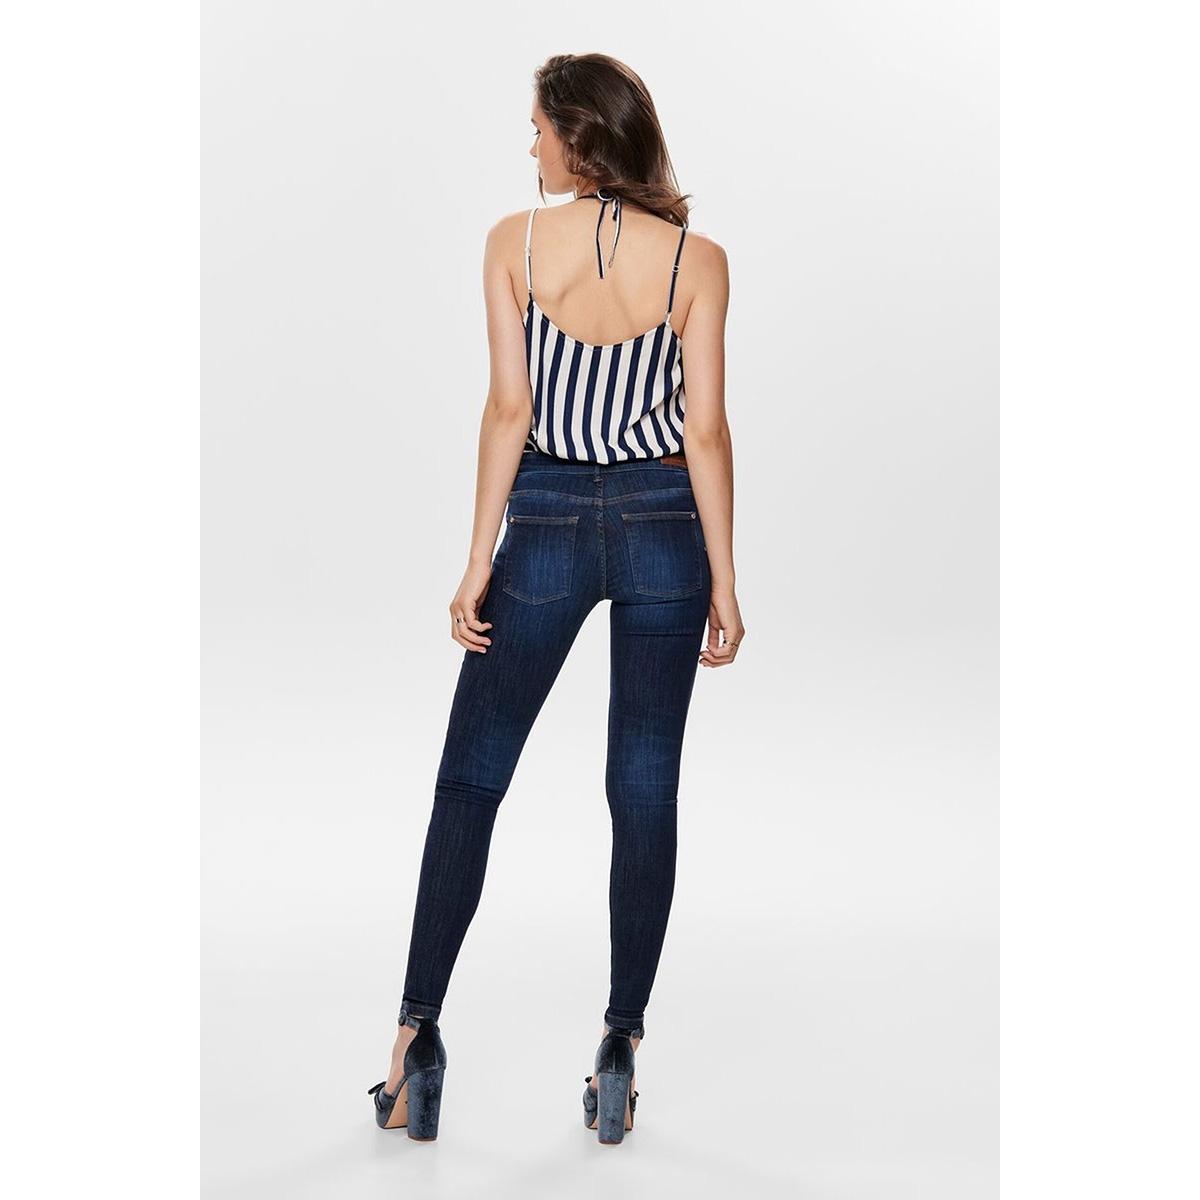 jdyknight skinny reg dark blue dnm 15182662 jacqueline de yong jeans dark blue denim